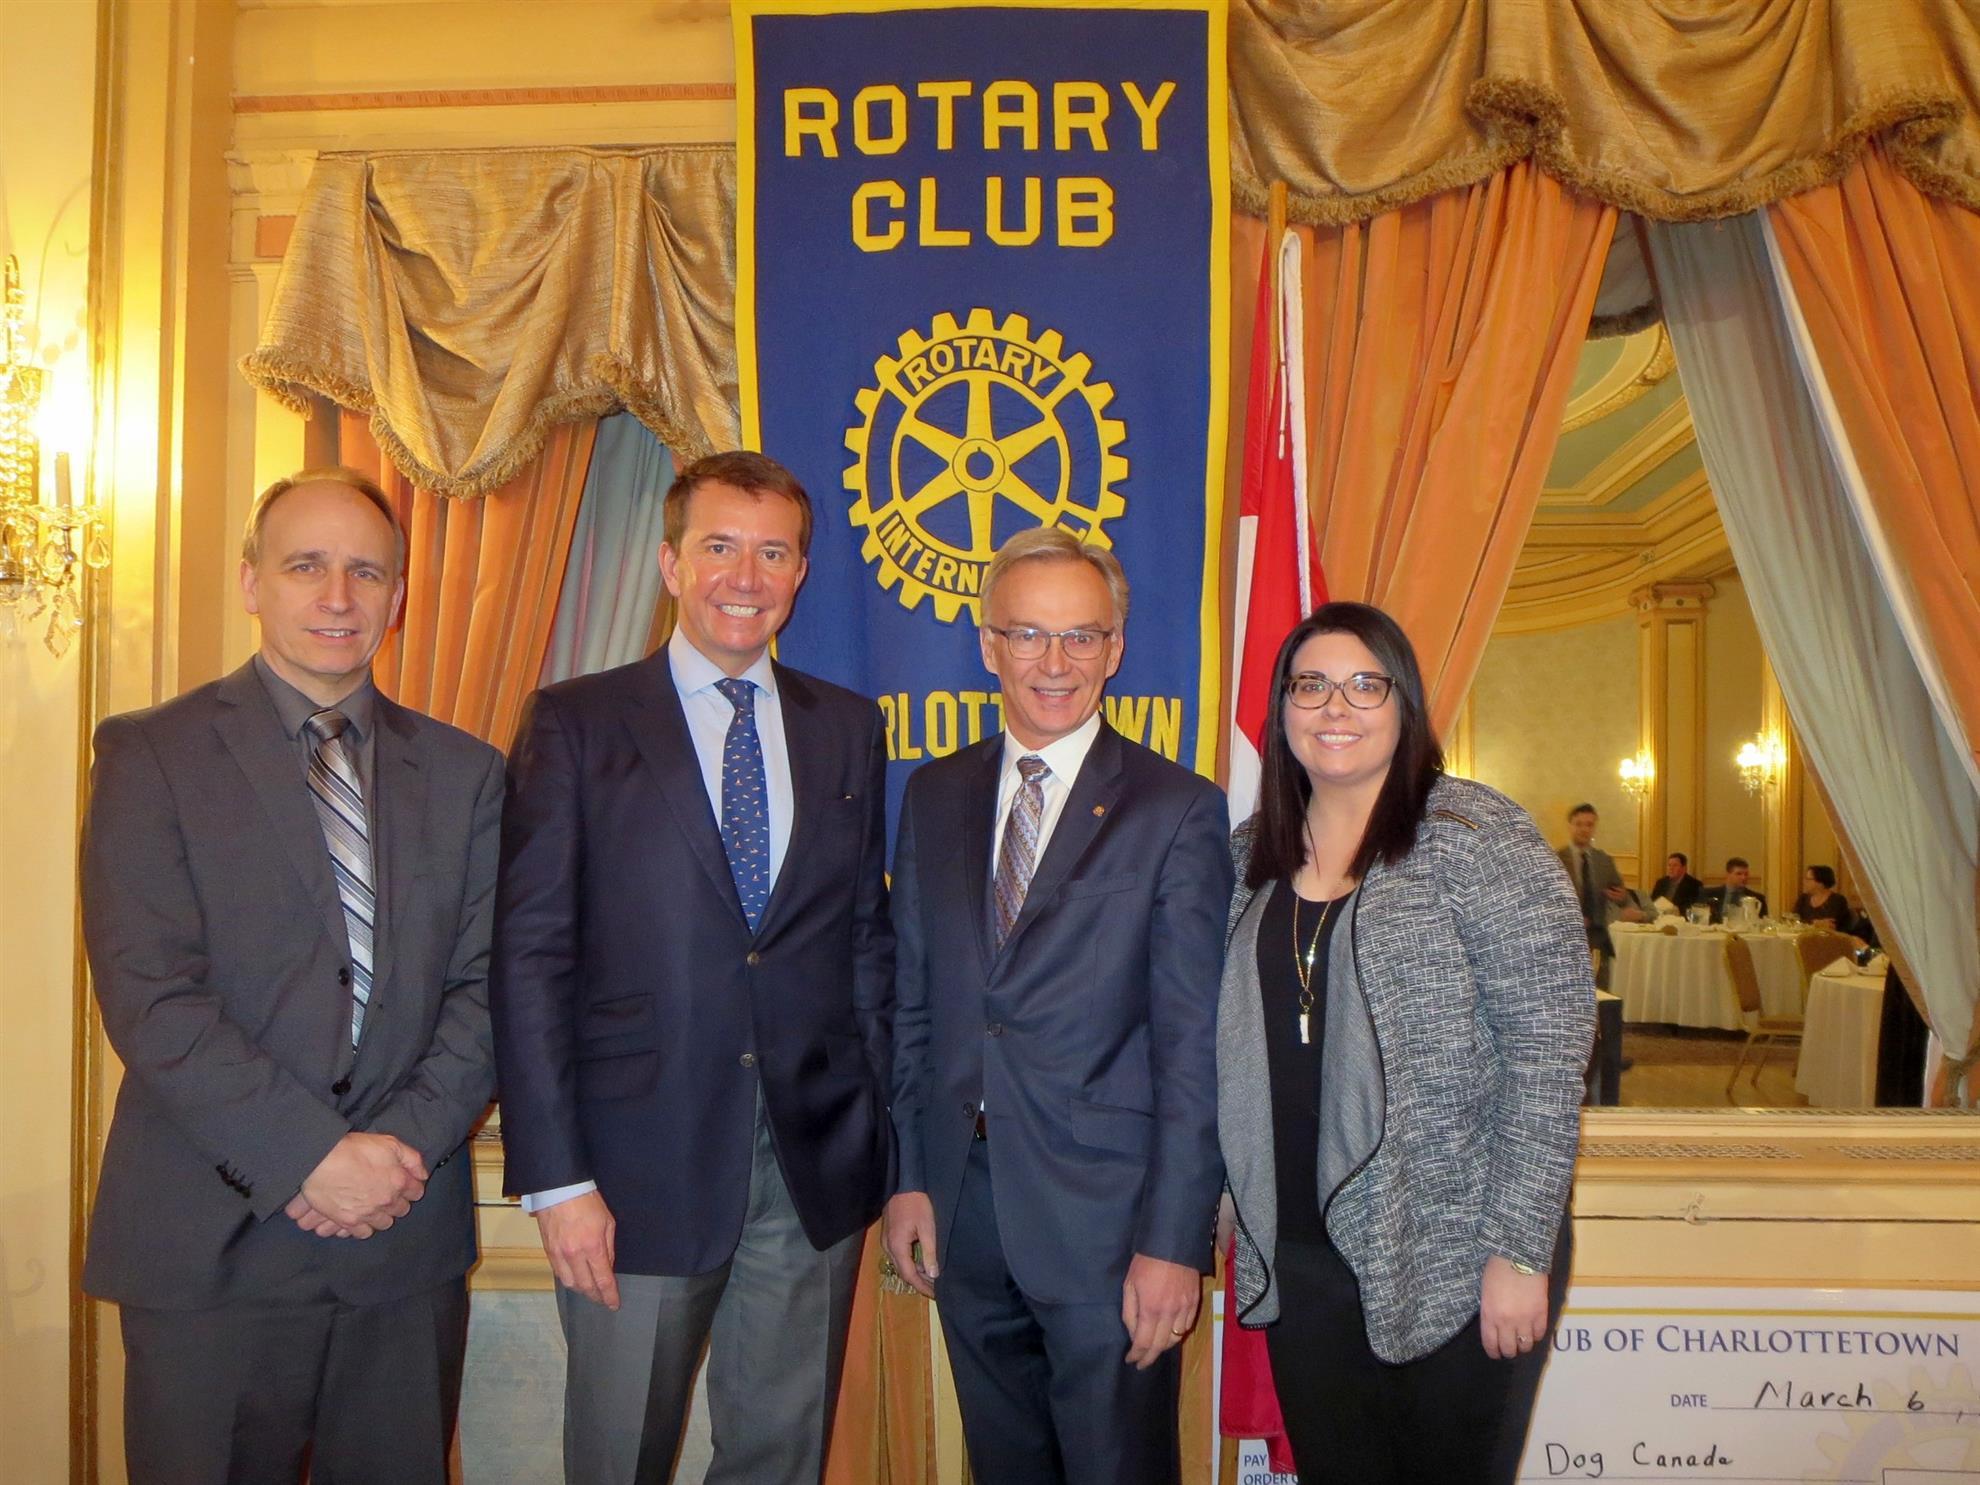 Stories | Rotary Club of Charlottetown